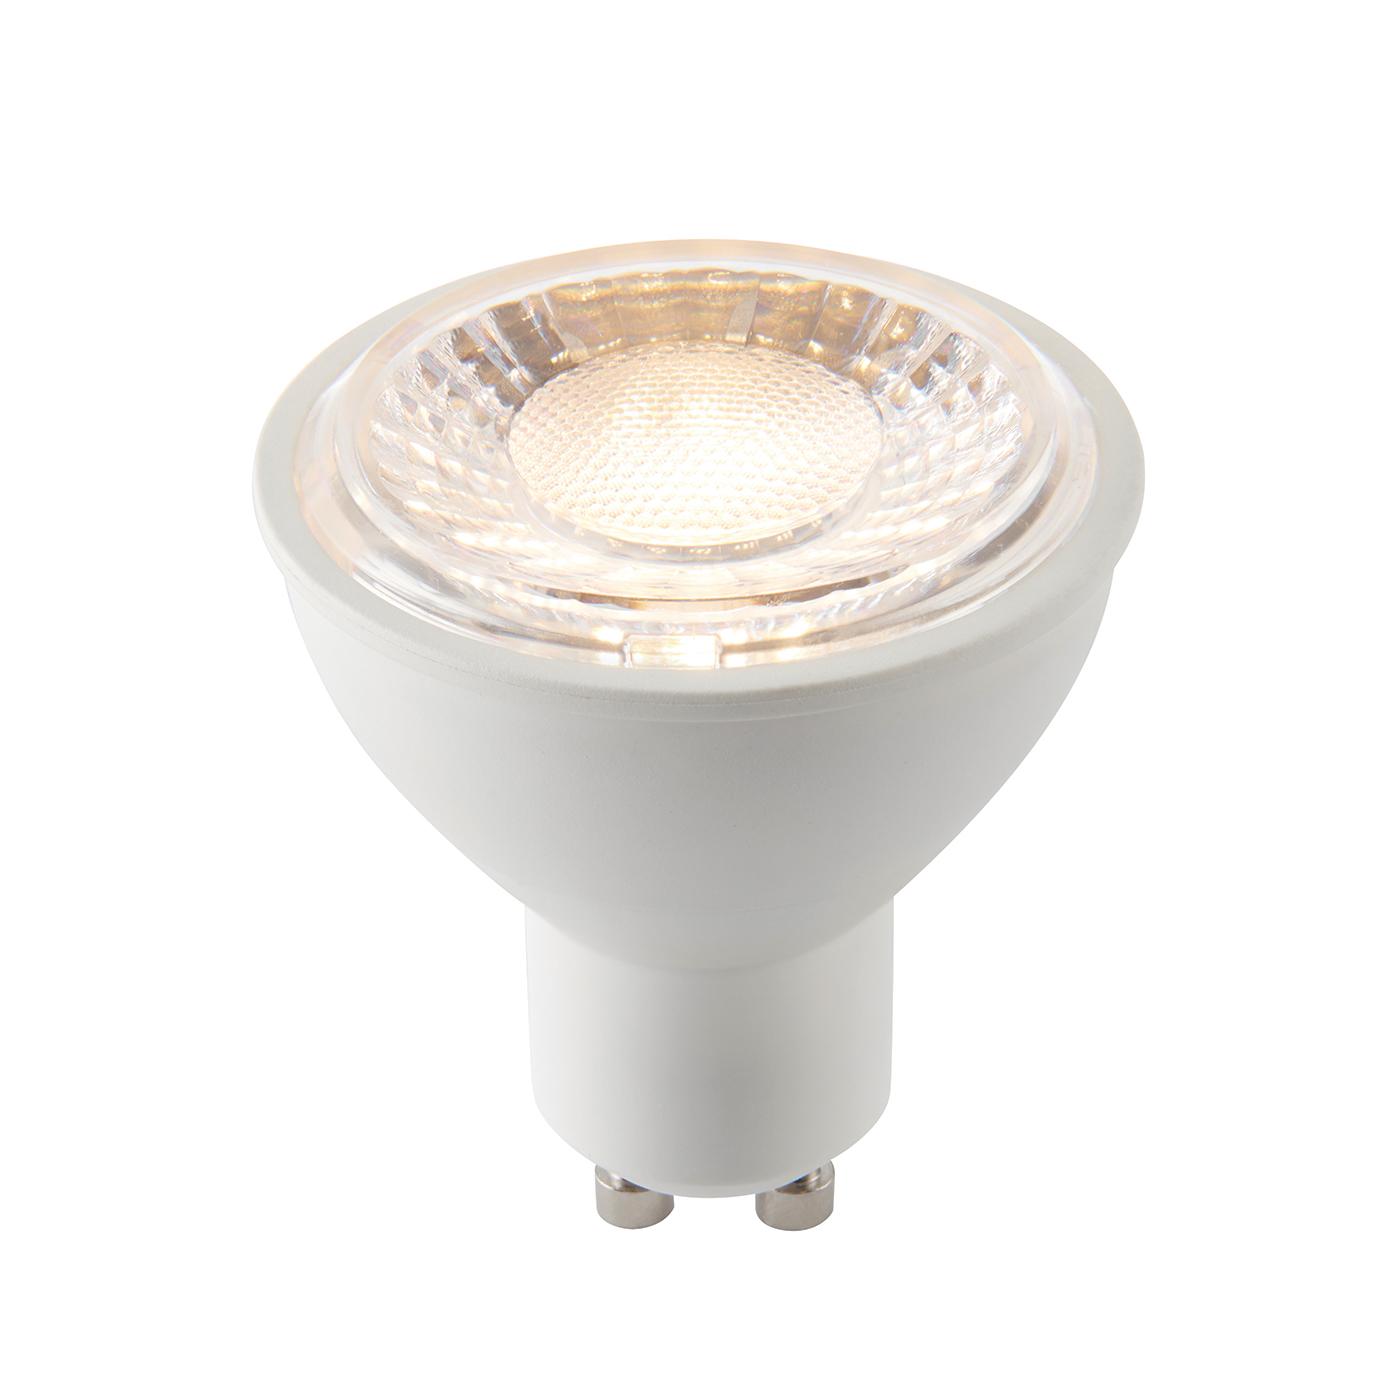 Endon 70055 LED SMD Lamp 3000K GU10 7W